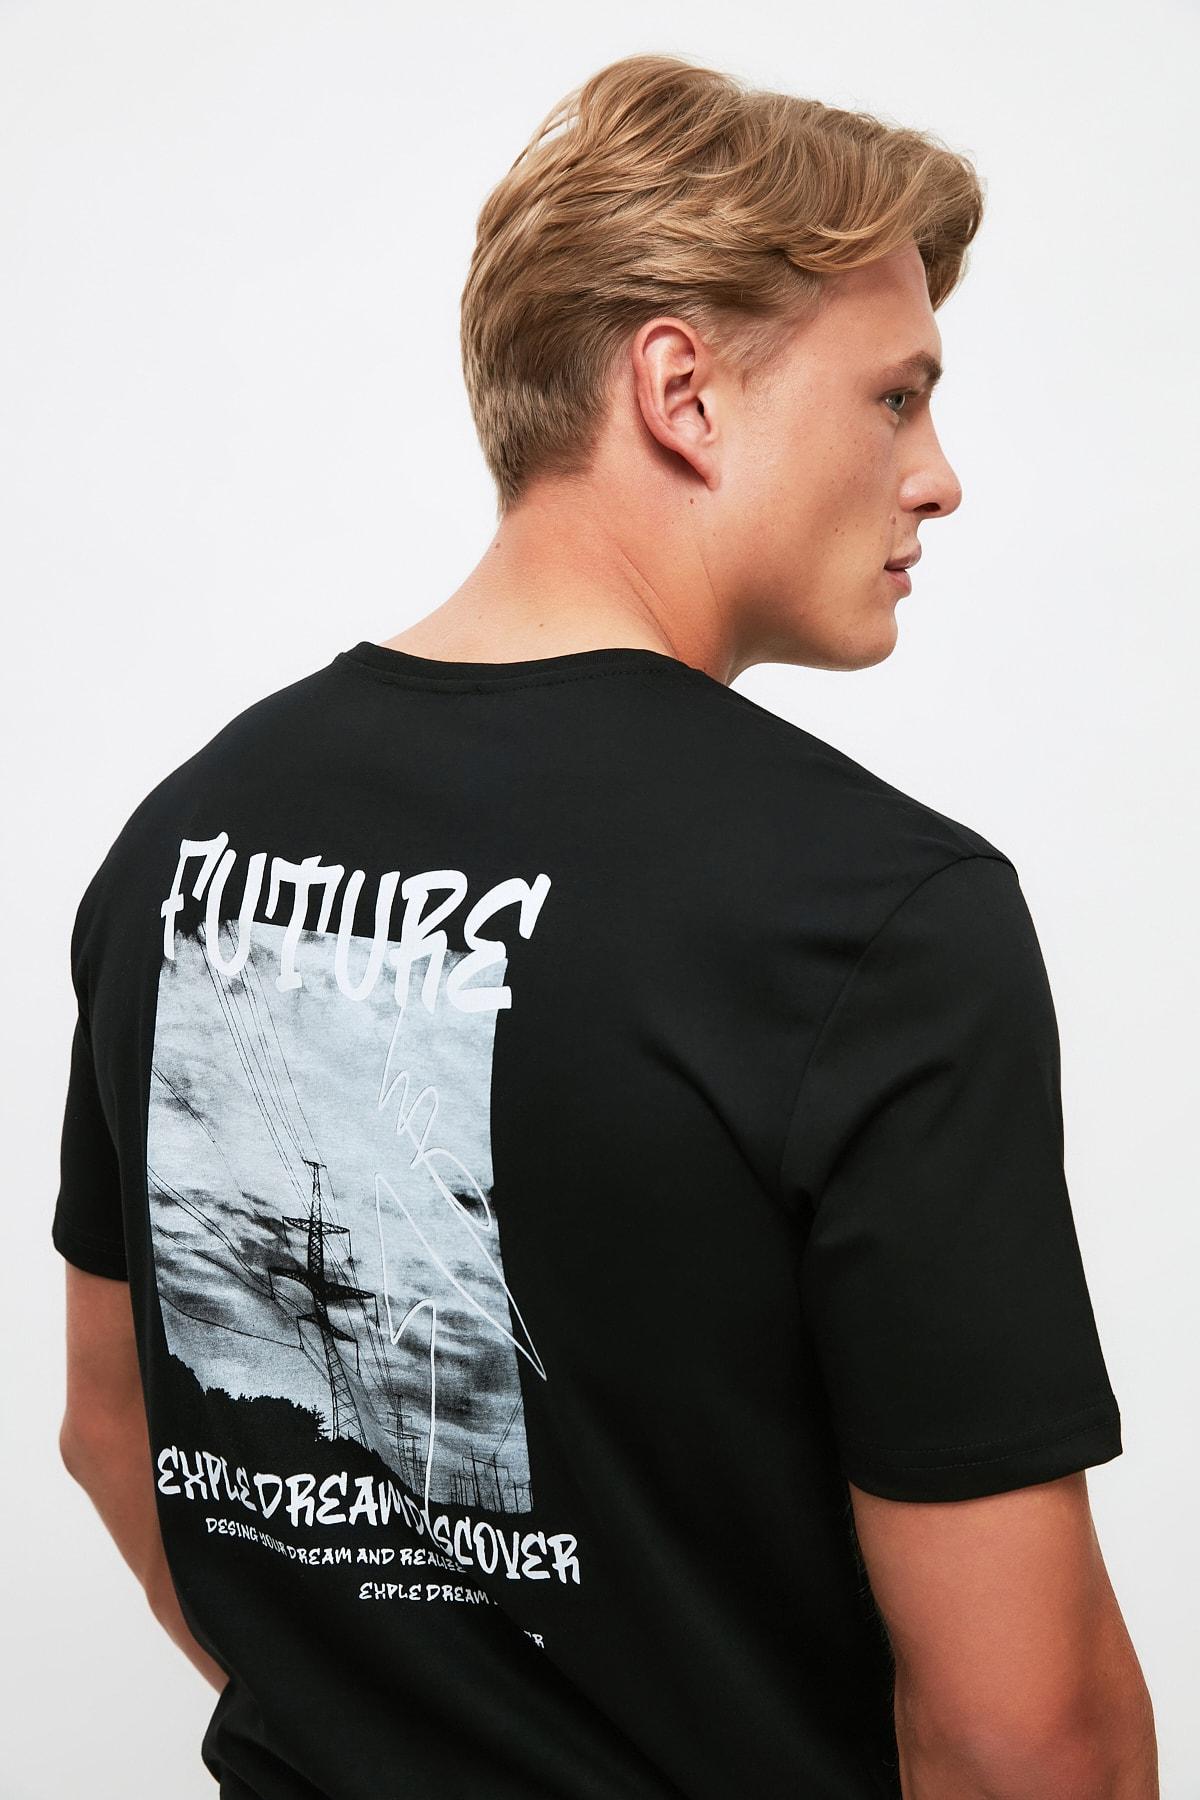 تی شرت فانتزی برند ترندیول مرد رنگ مشکی کد ty107186905